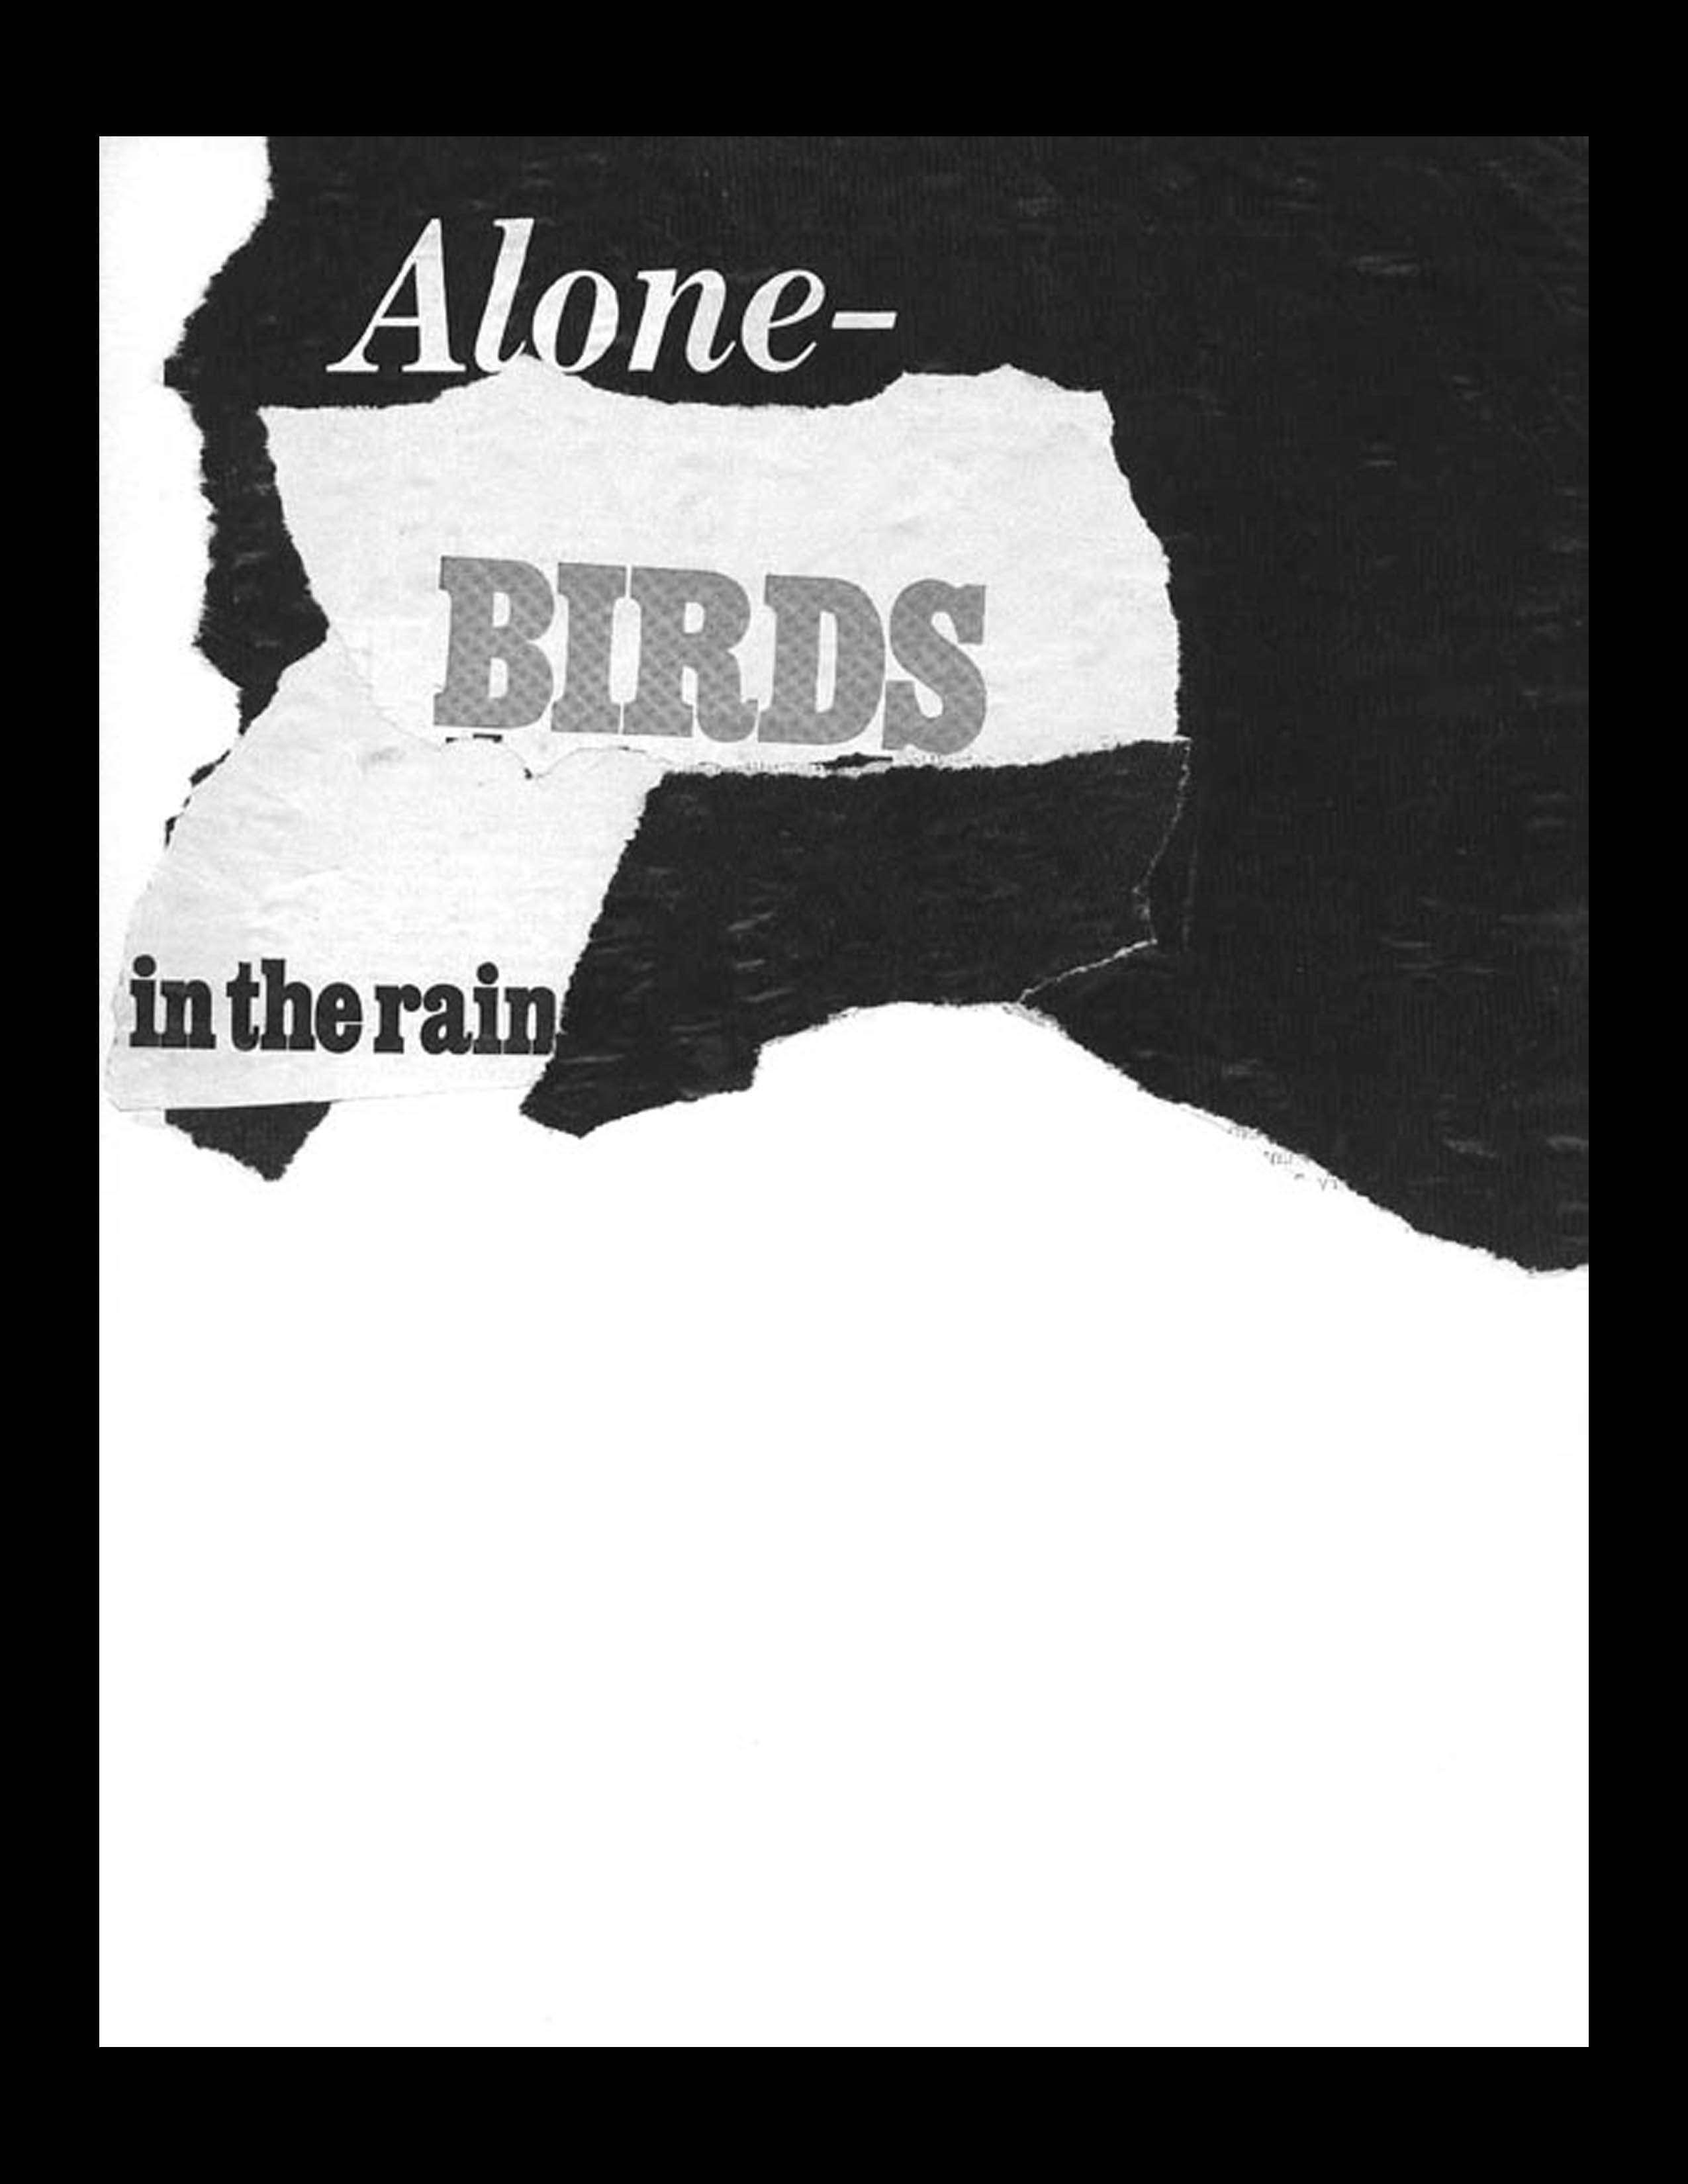 alone (1974)